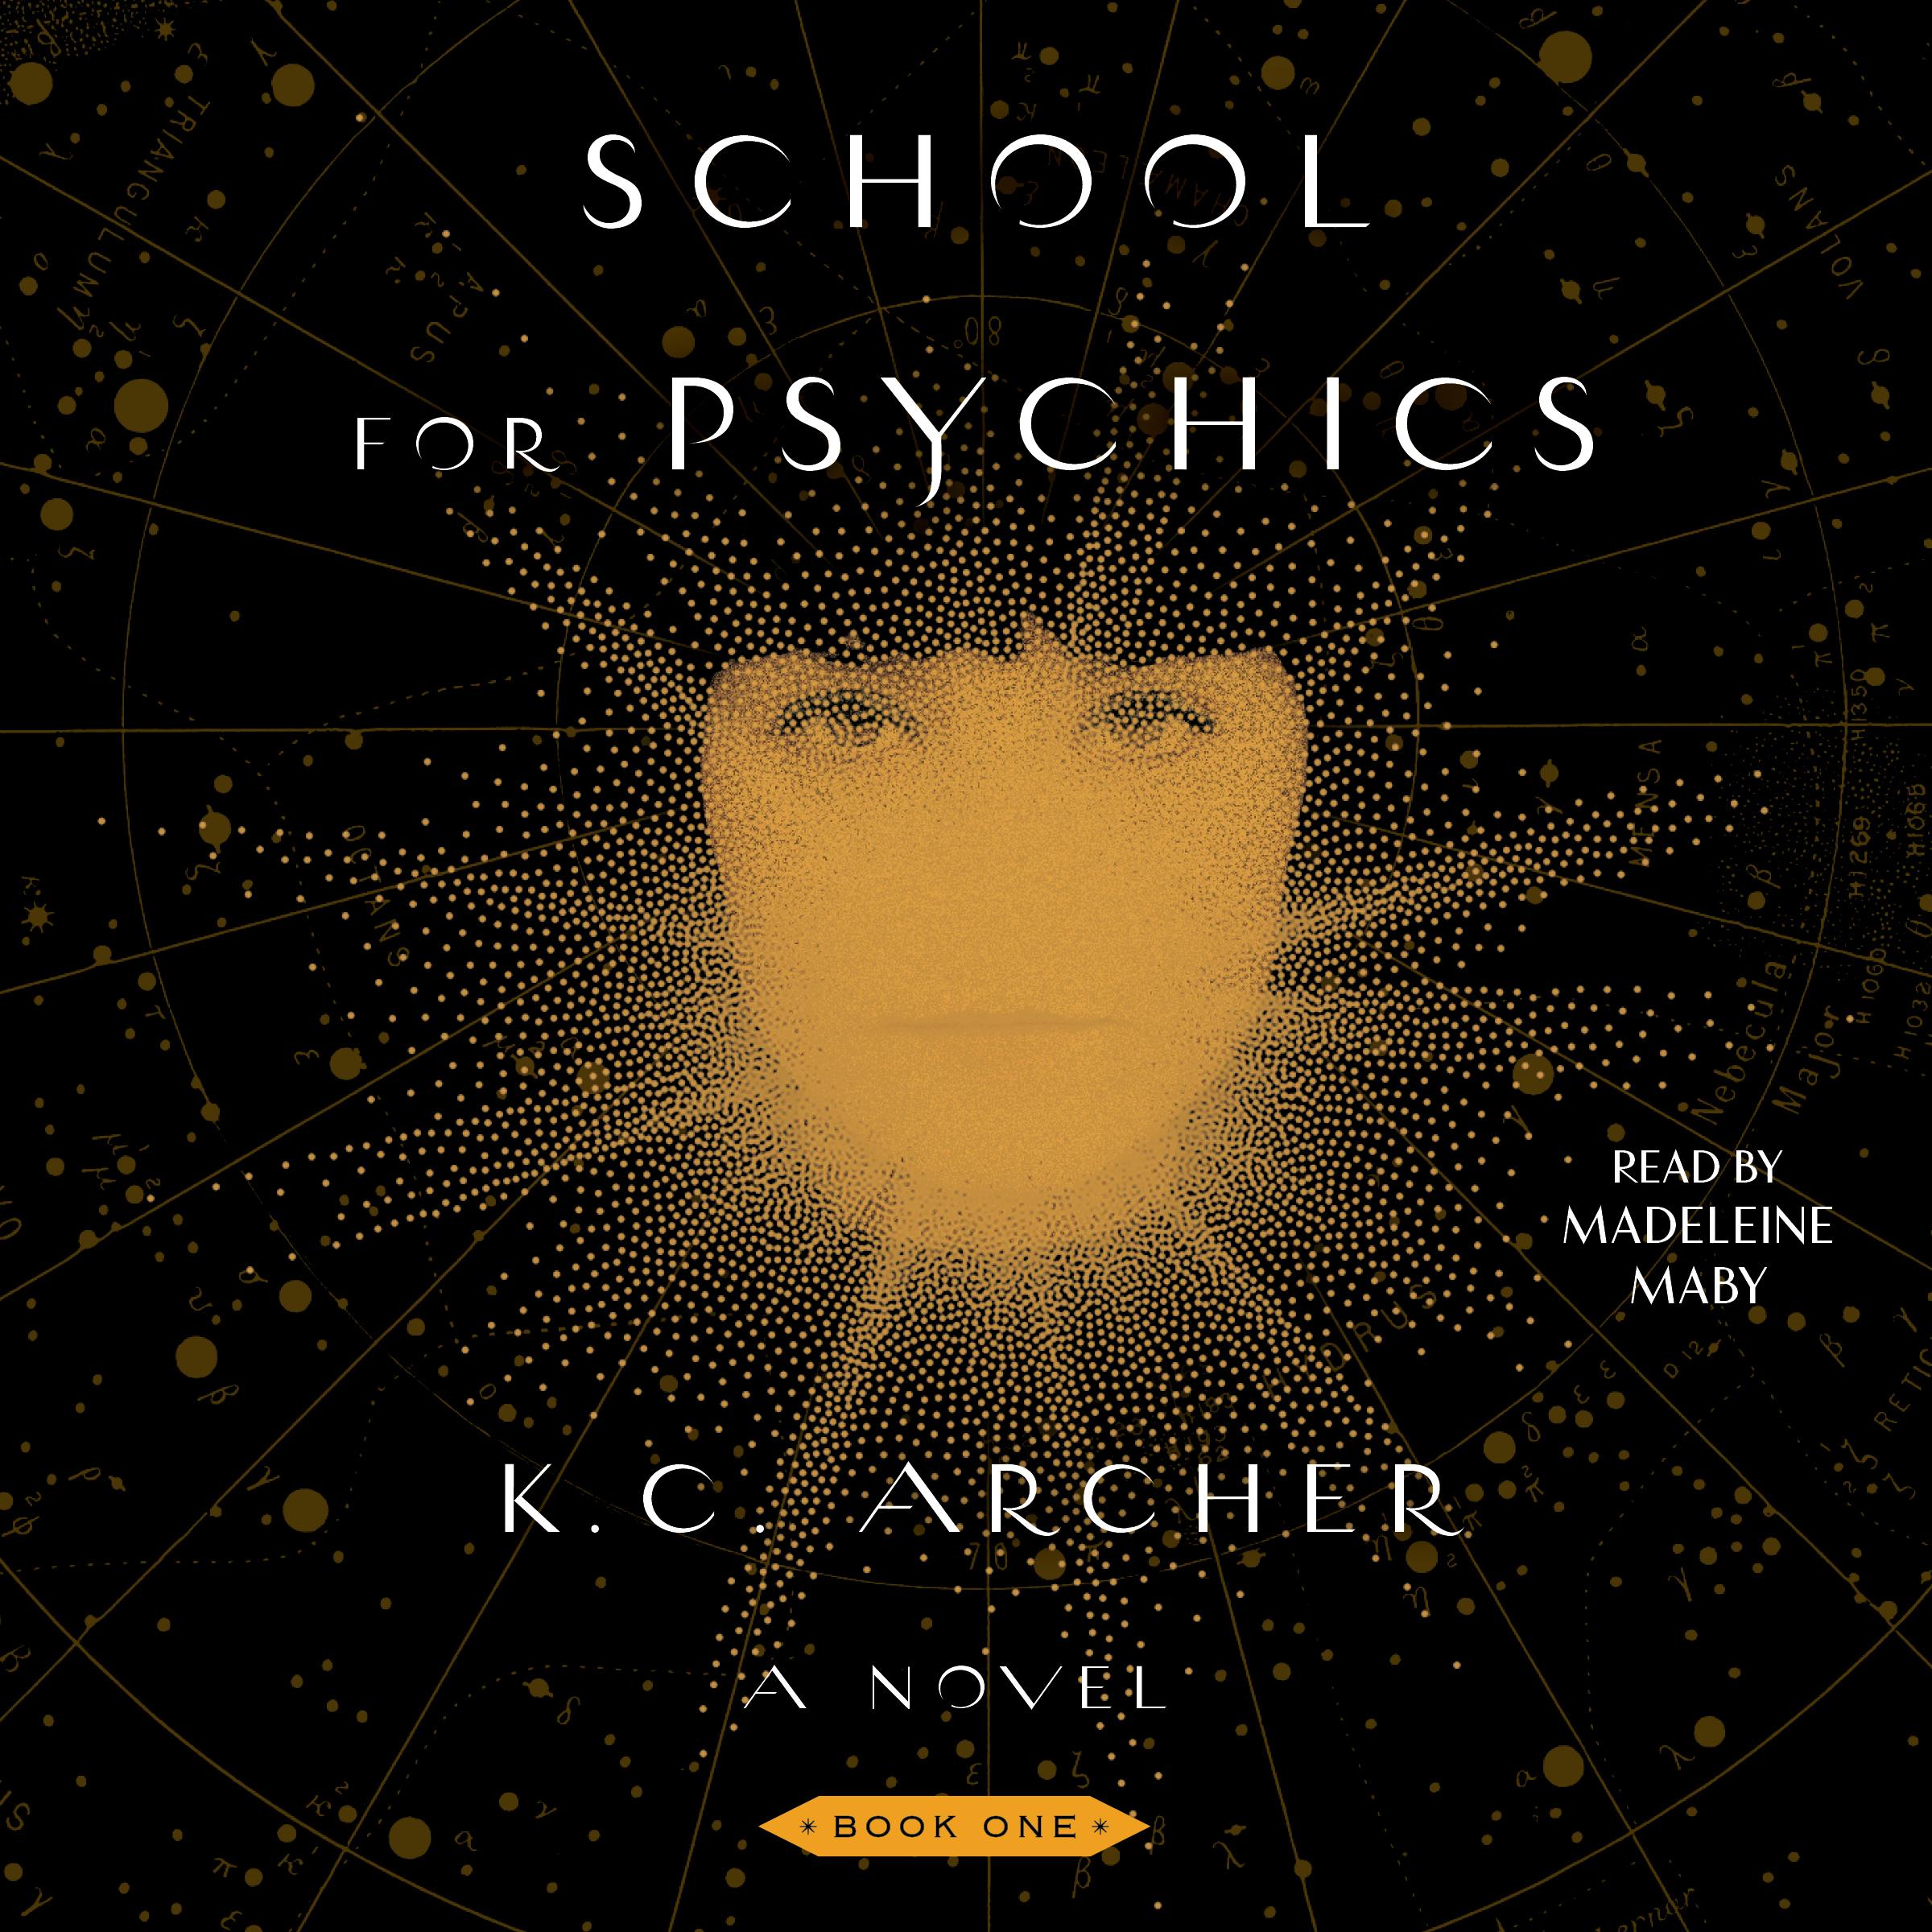 School for psychics 9781508254355 hr